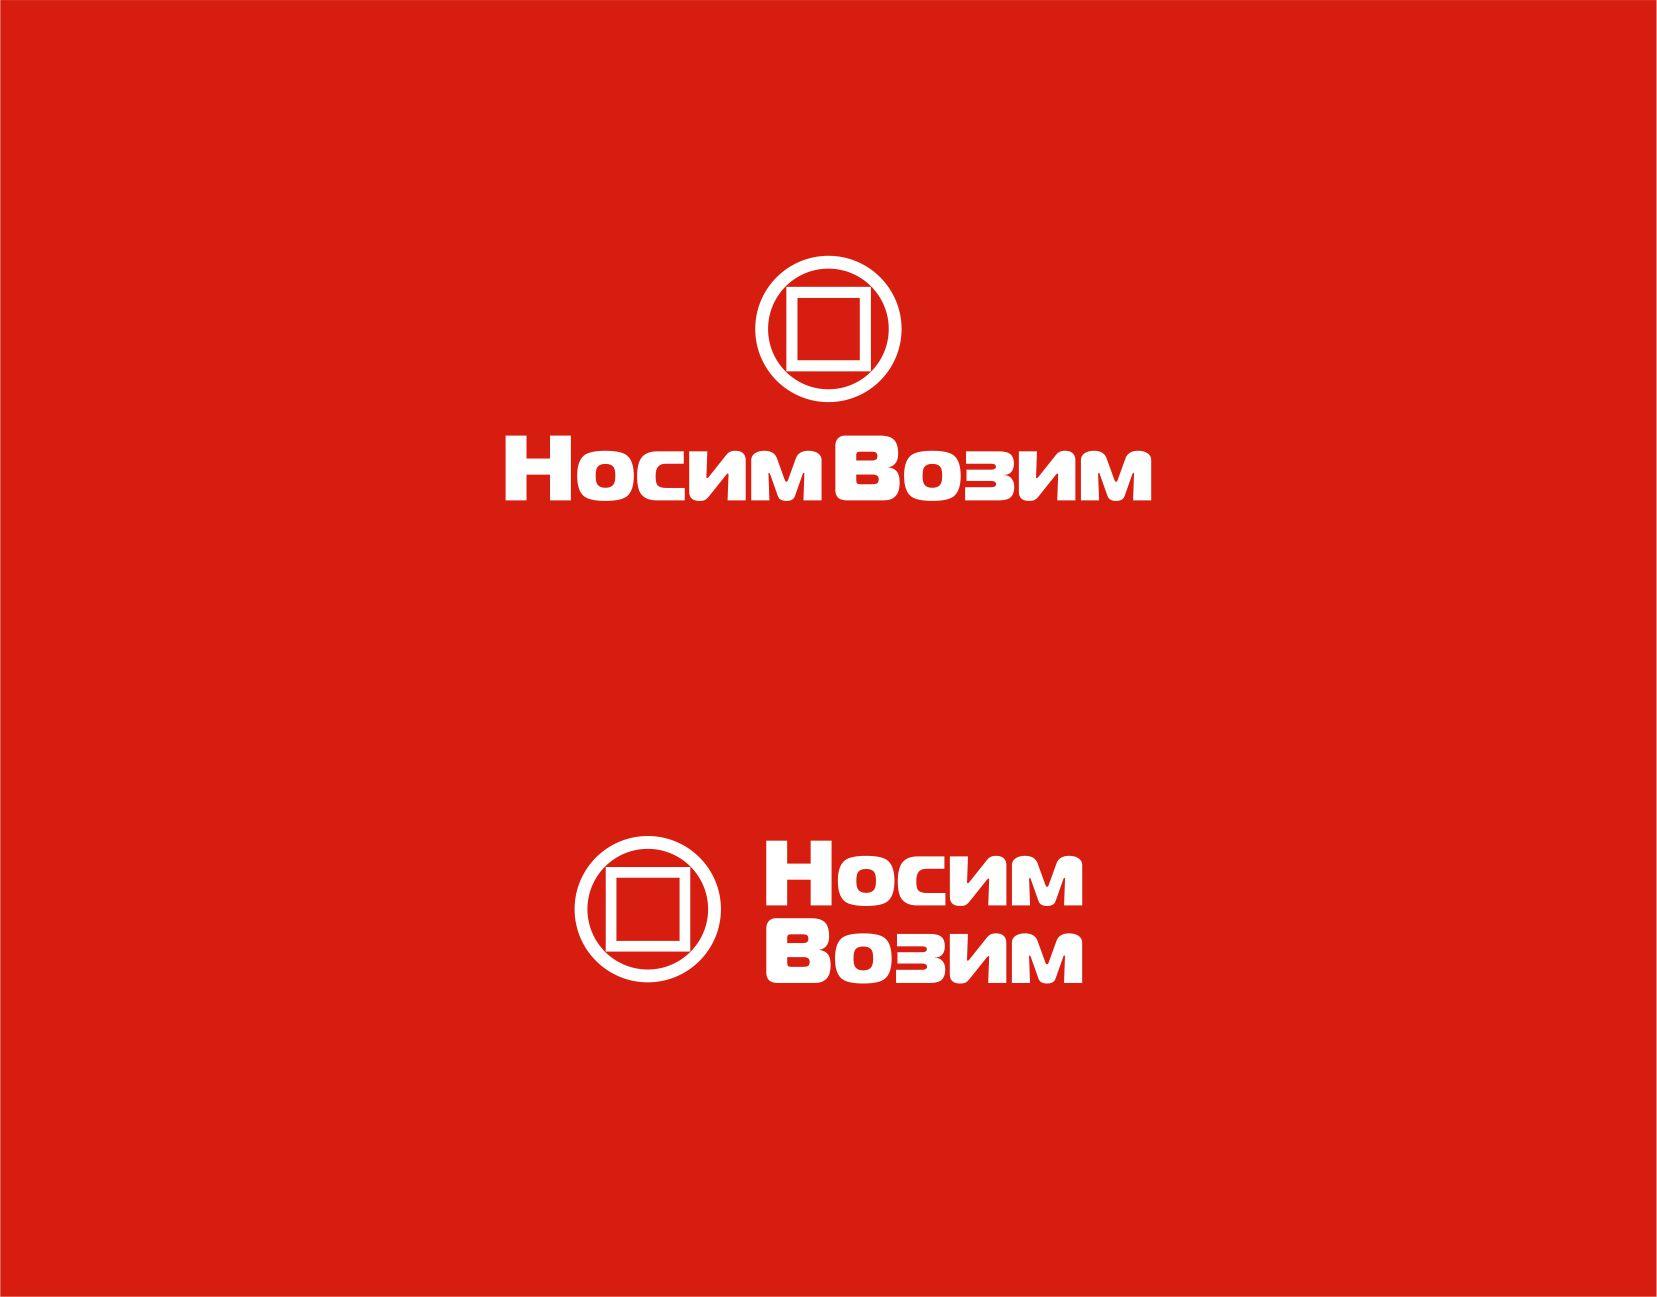 Логотип компании по перевозкам НосимВозим фото f_0215cfa2d40b053a.jpg